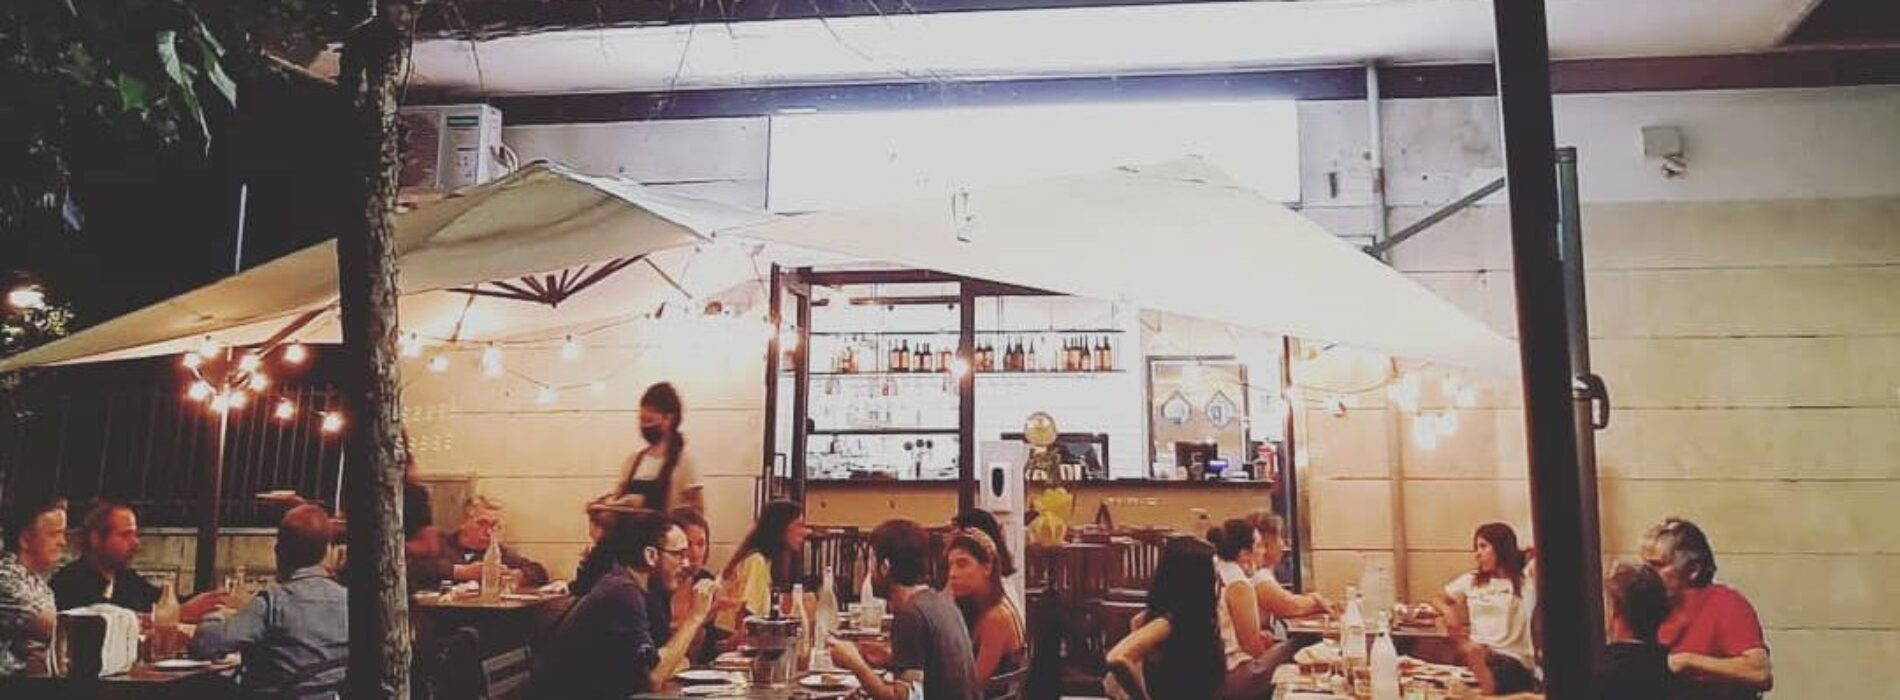 Friccico Mangia e Bevi a Roma, tartare rosette e foie gras ai Colli Portuensi